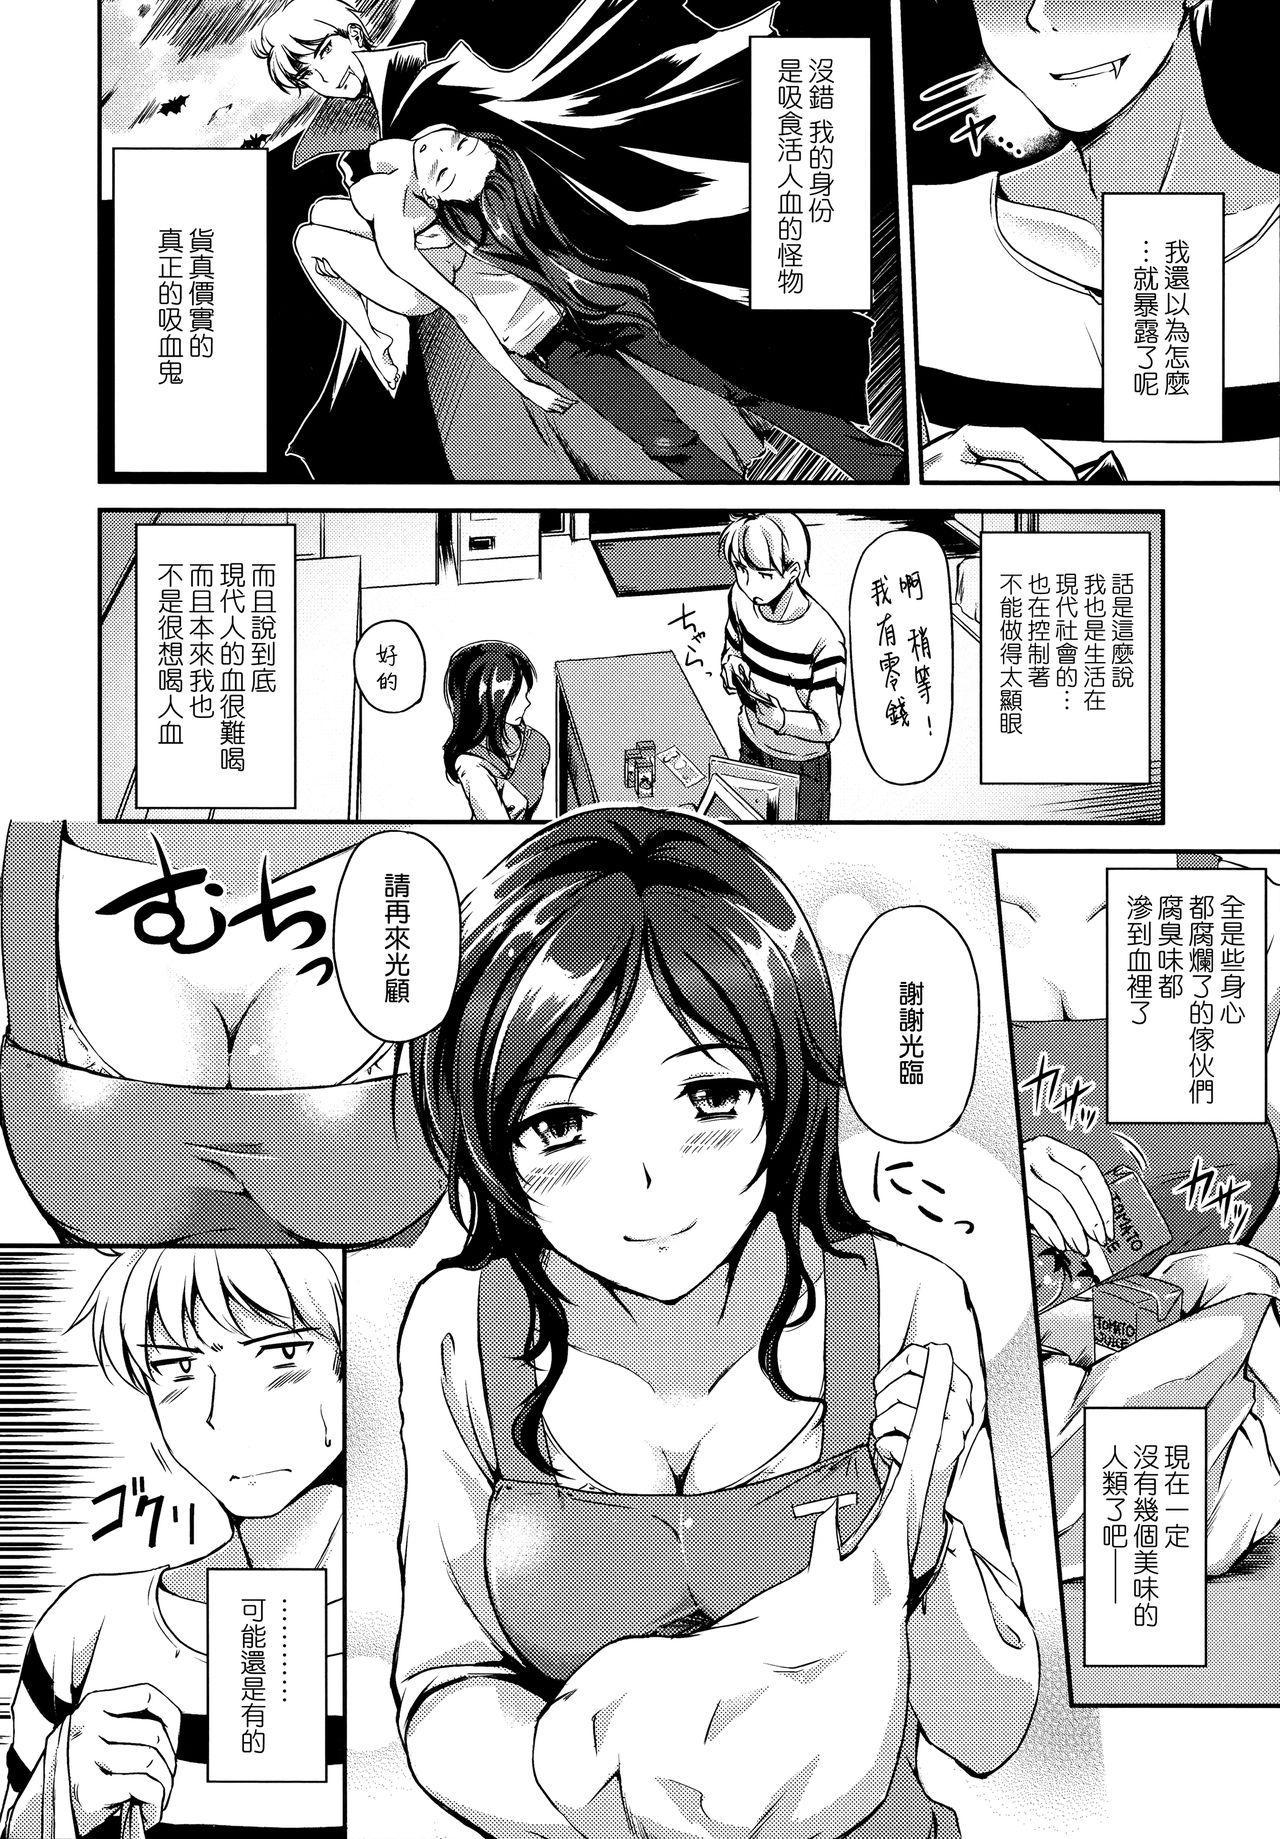 Kimagure Hanabira + Toranoana Leaflet 86